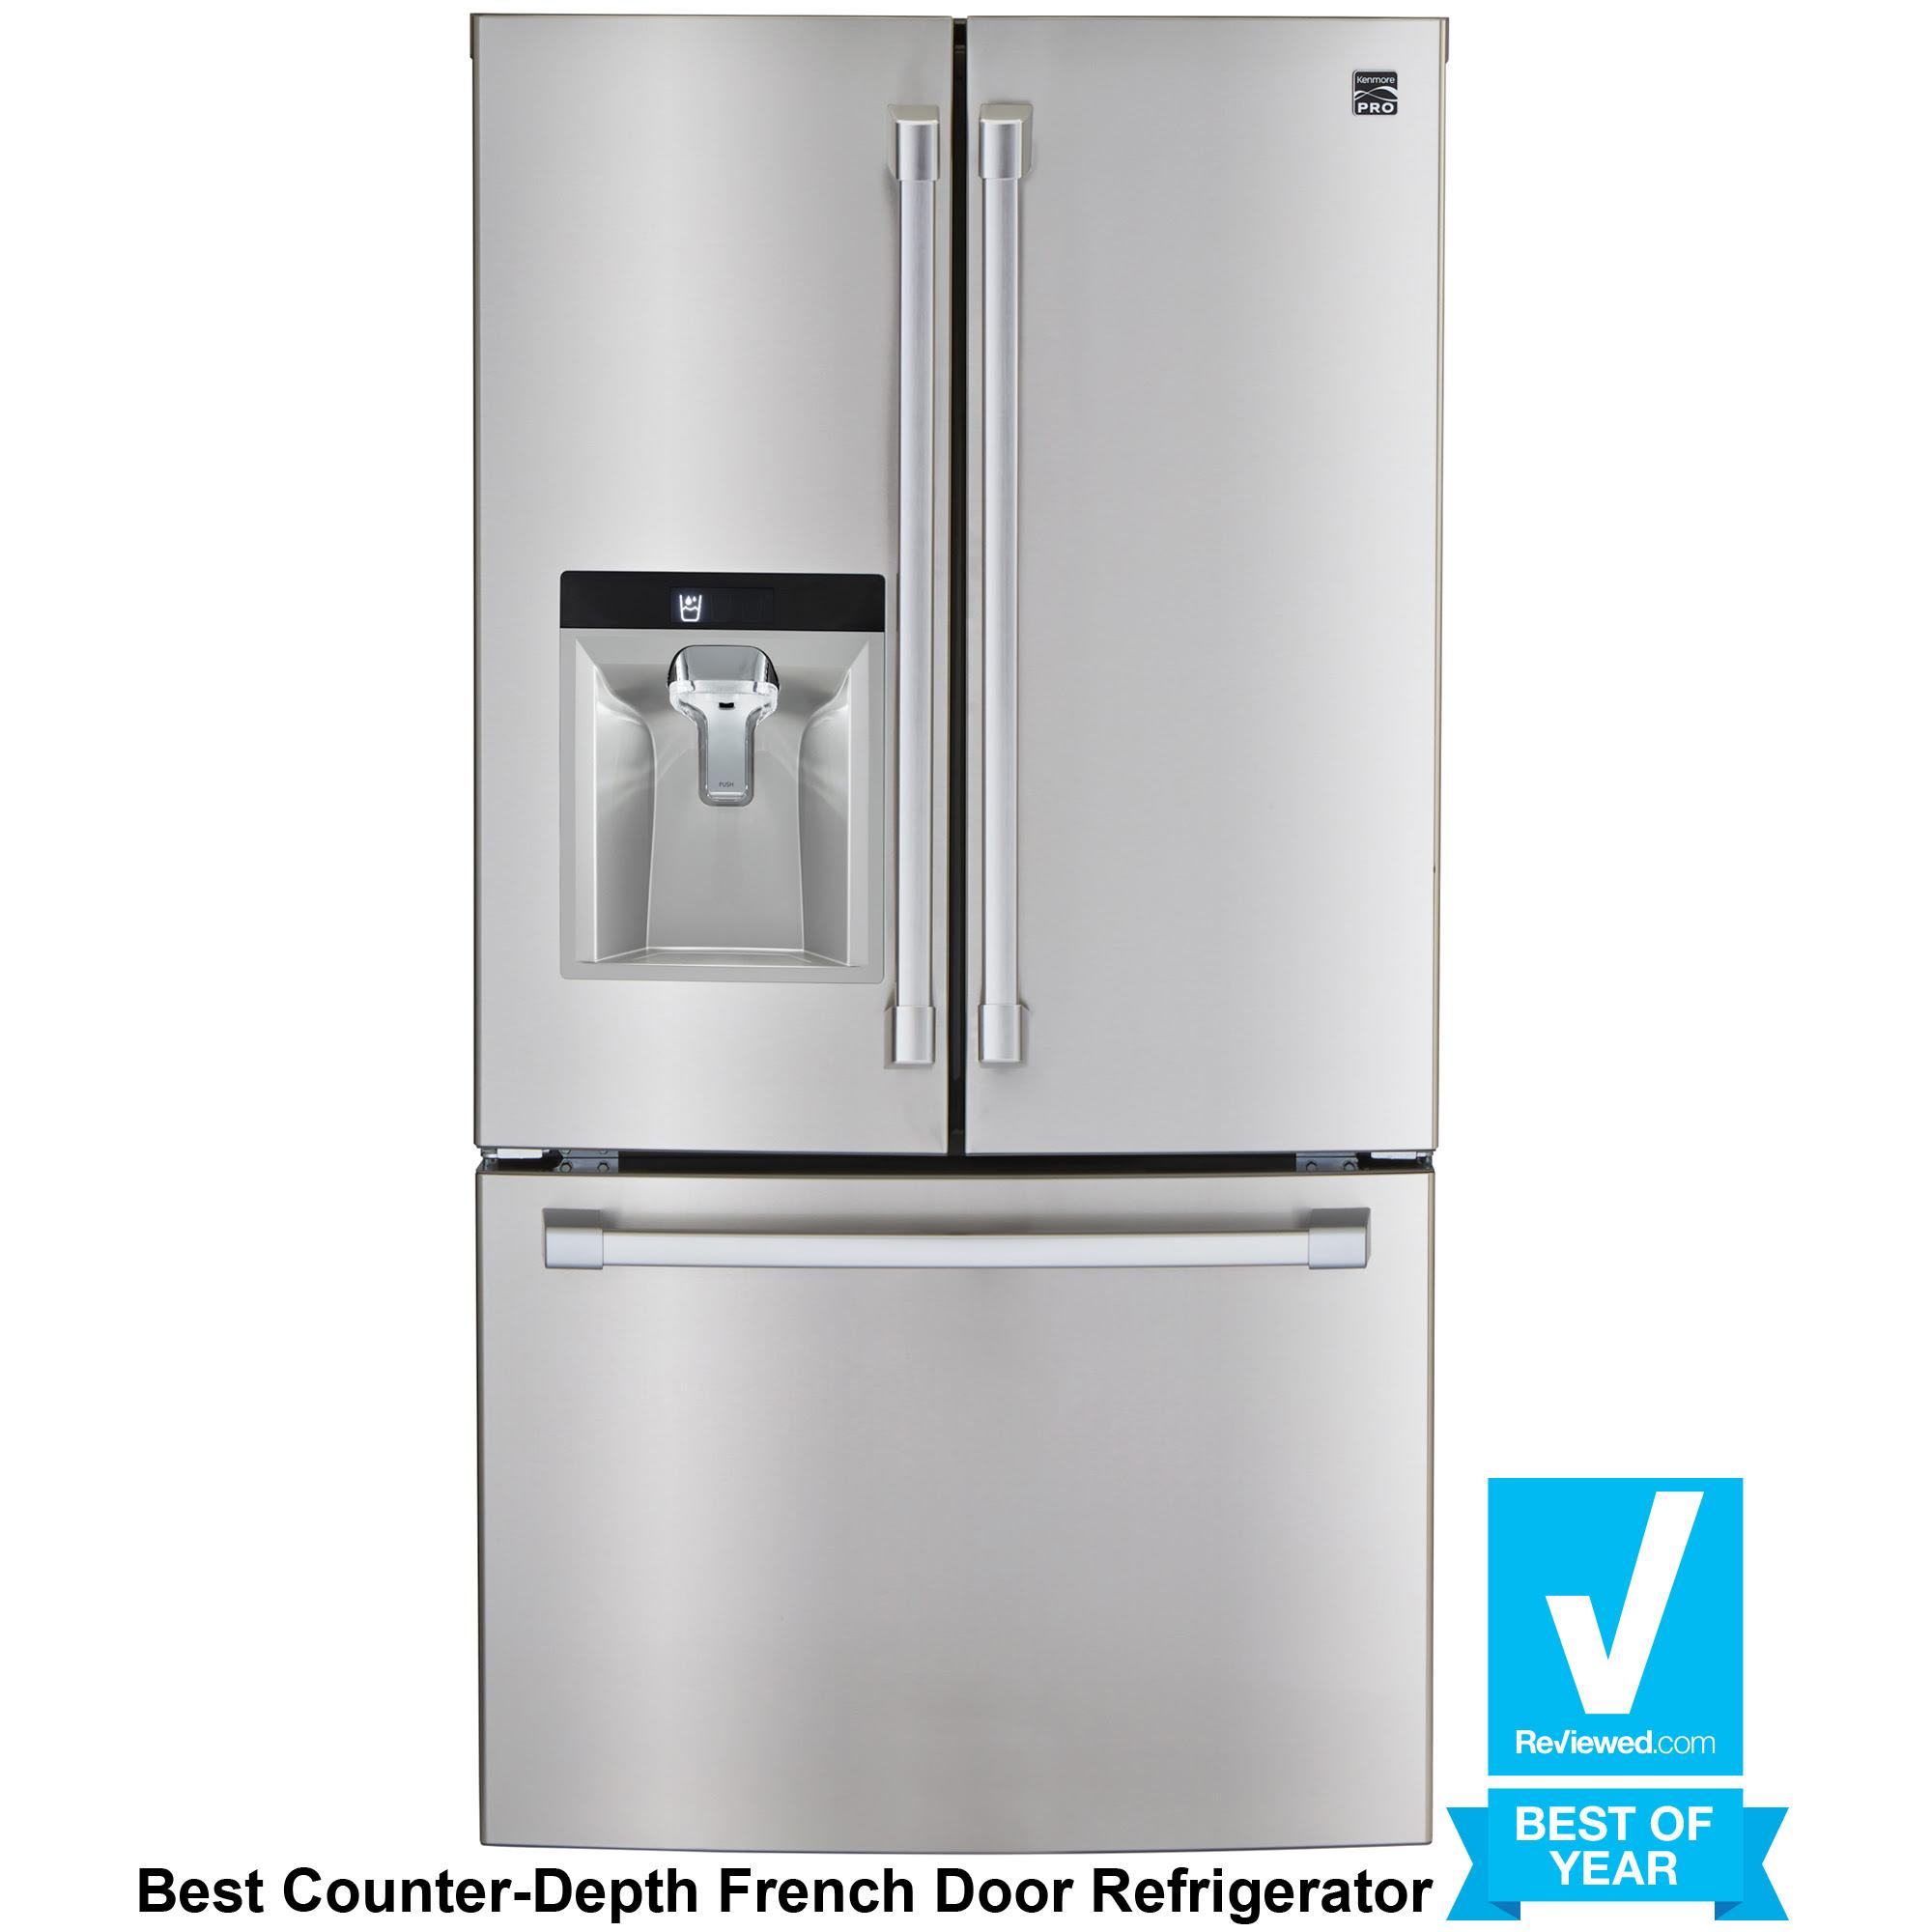 How deep is a counter depth refrigerator